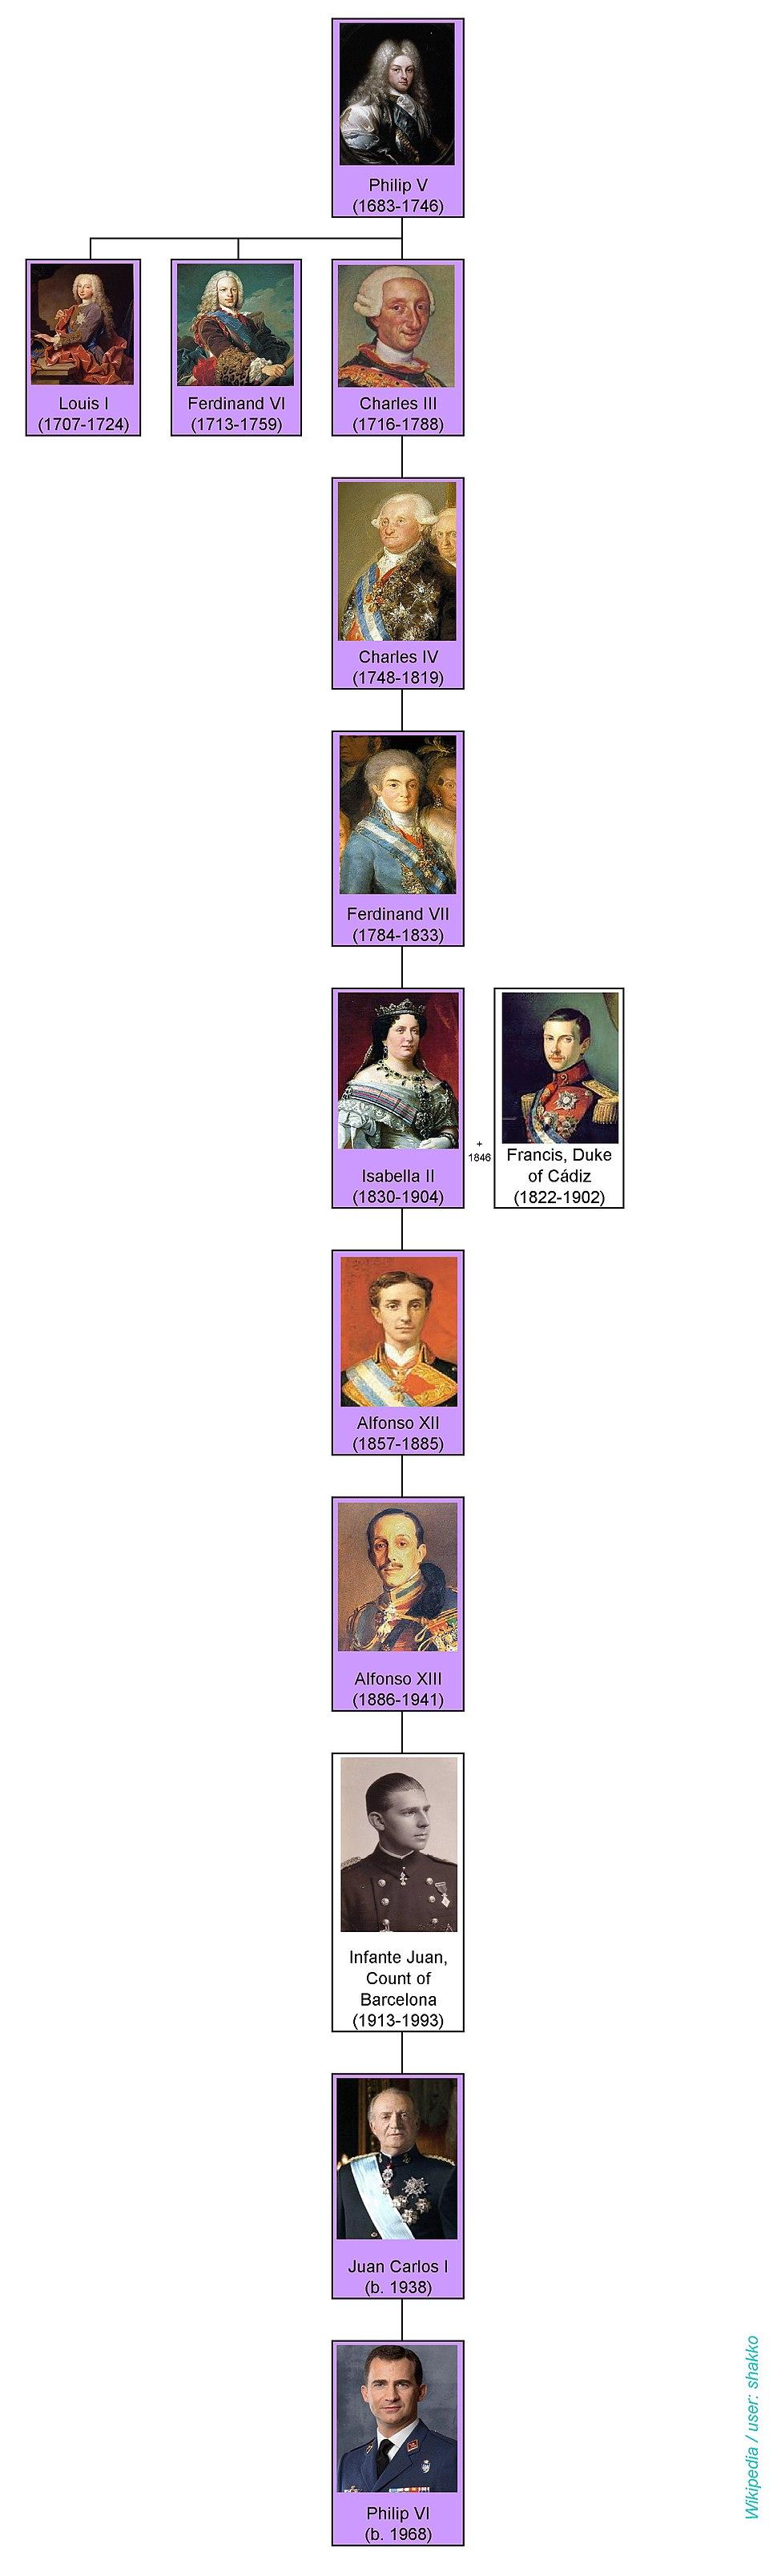 Dinasty Bourbon (Spain) - kings2 - family tree by shakko (EN)